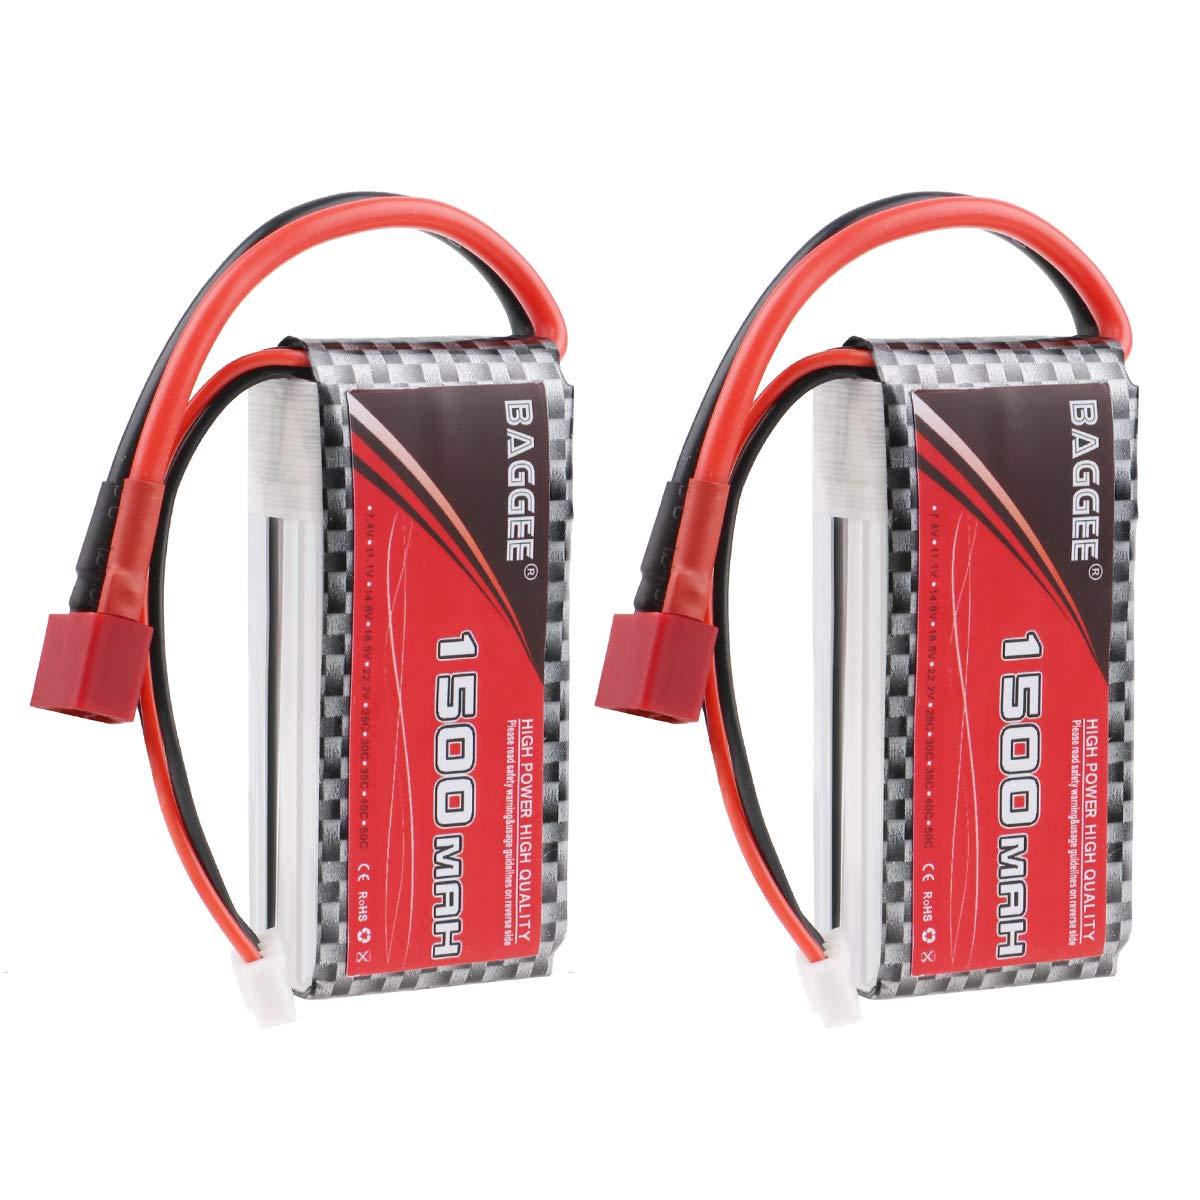 2 Baterias Lipo  2S 1500mAh 7.4v 25C RC Pack con T Plug para